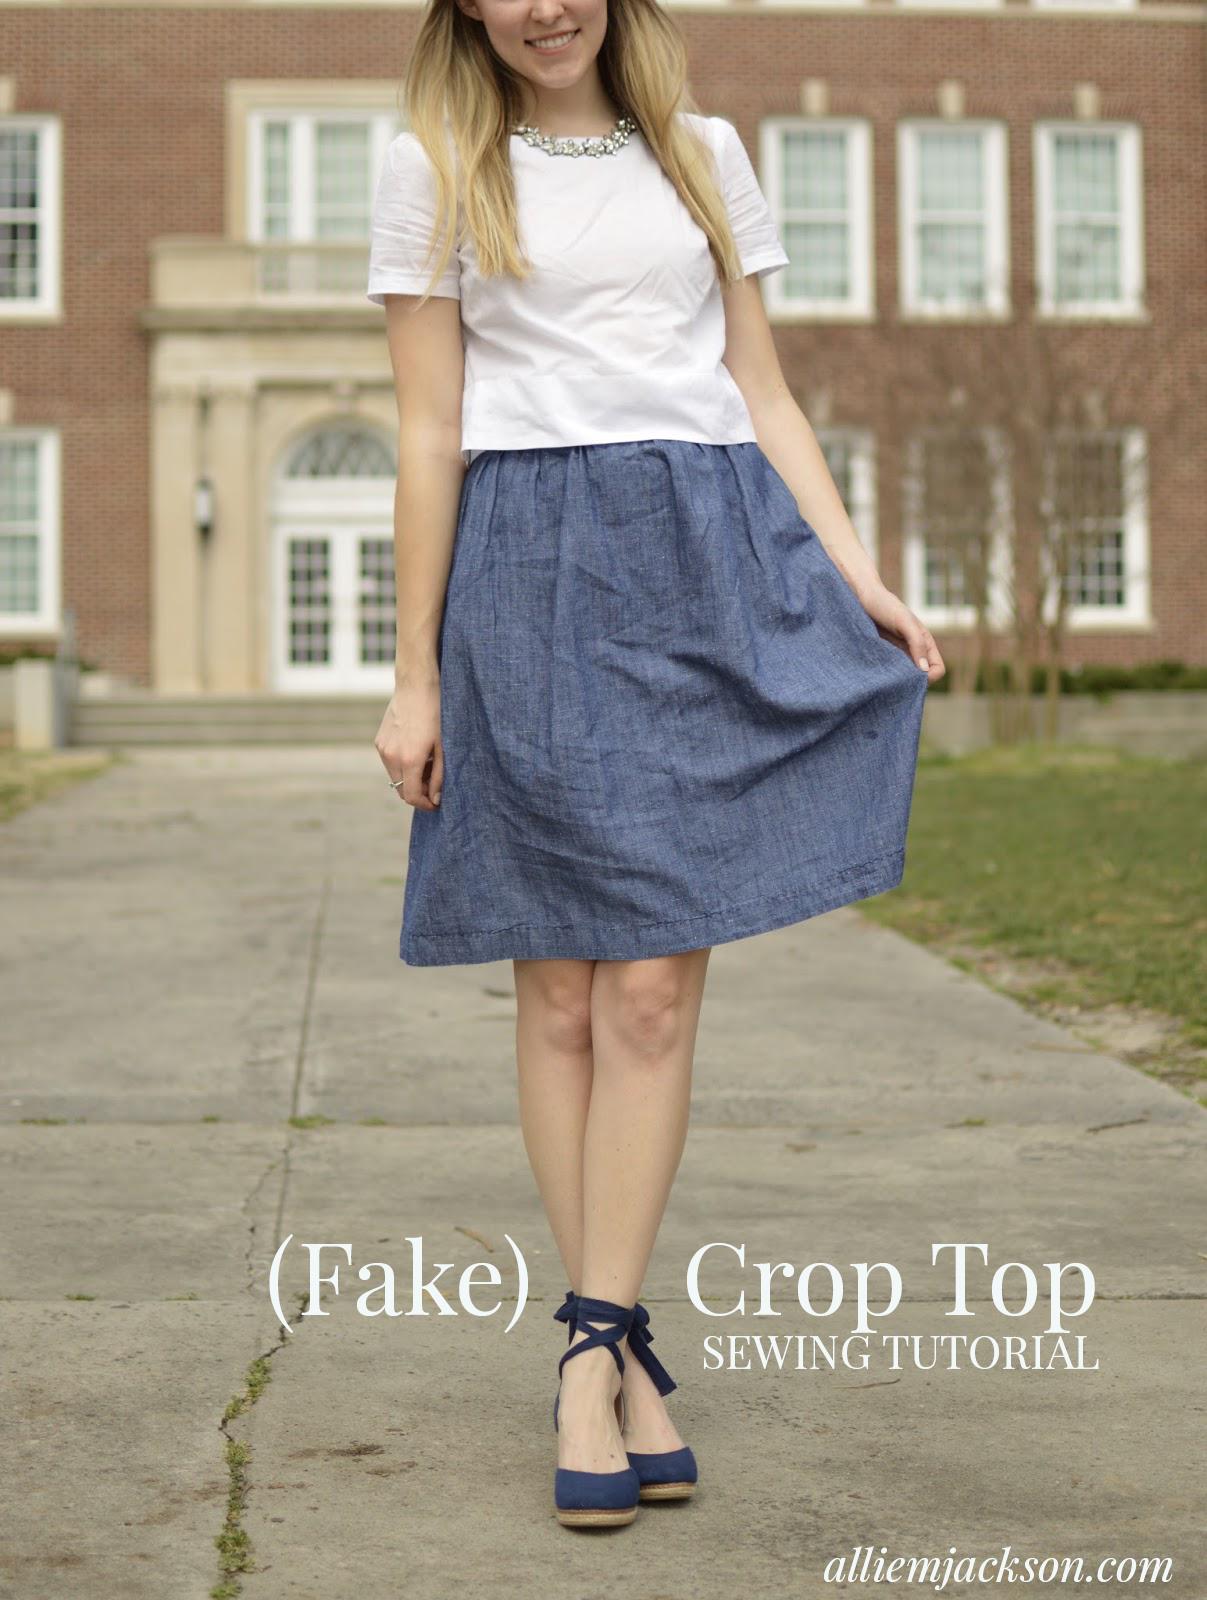 Make your own (fake) crop top